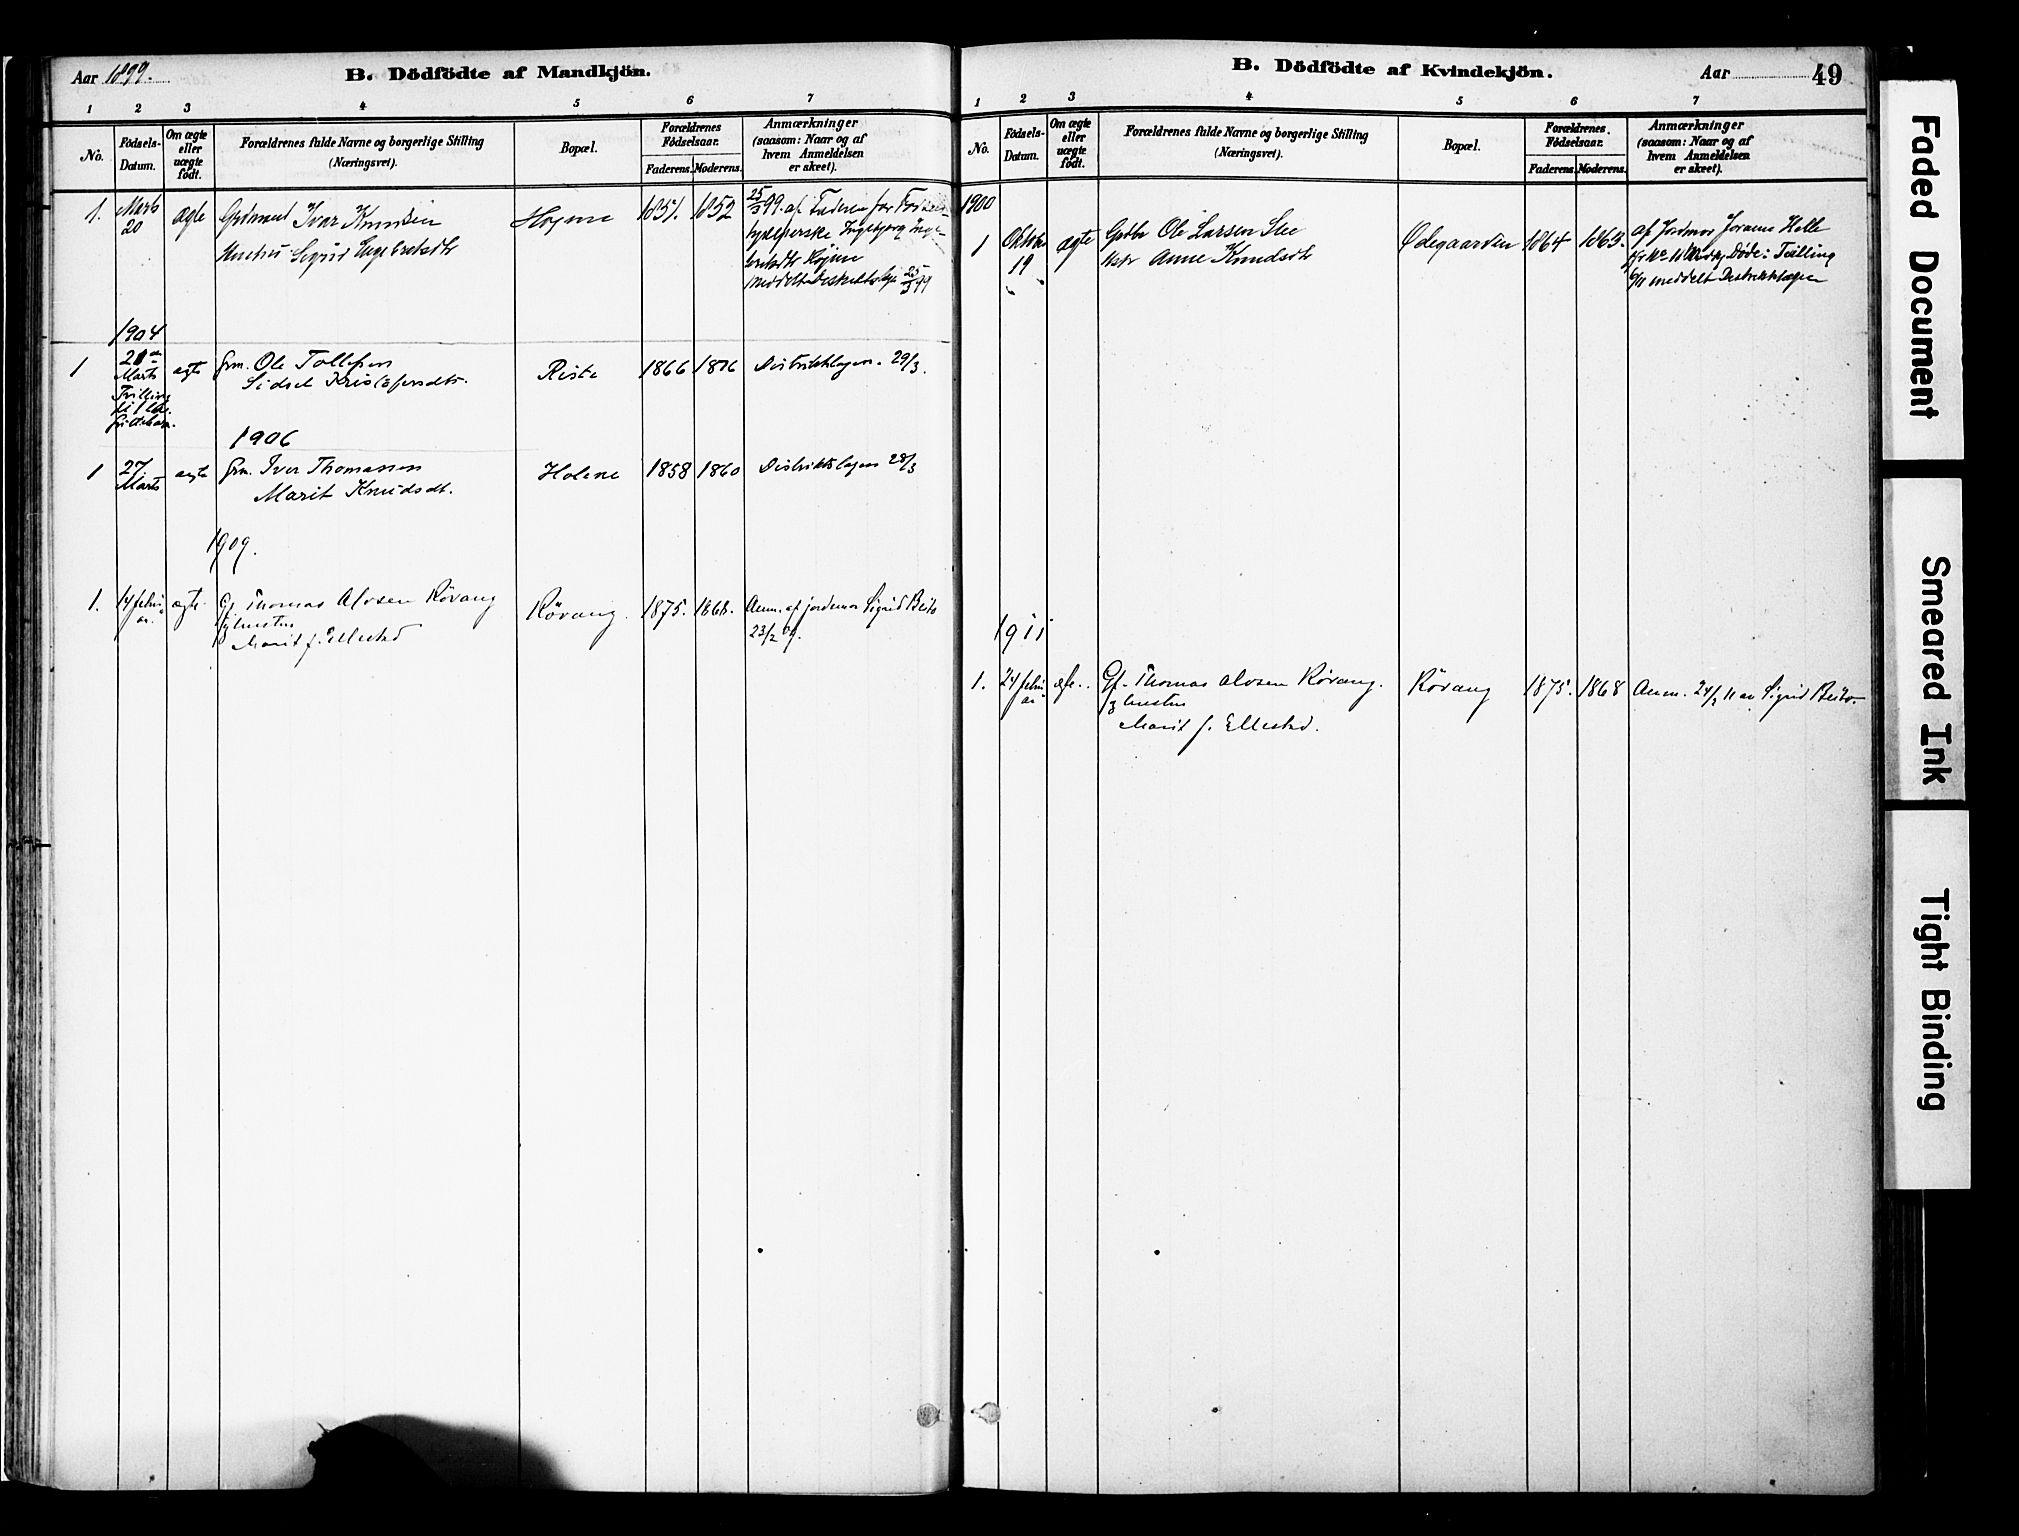 SAH, Vestre Slidre prestekontor, Ministerialbok nr. 5, 1881-1912, s. 49